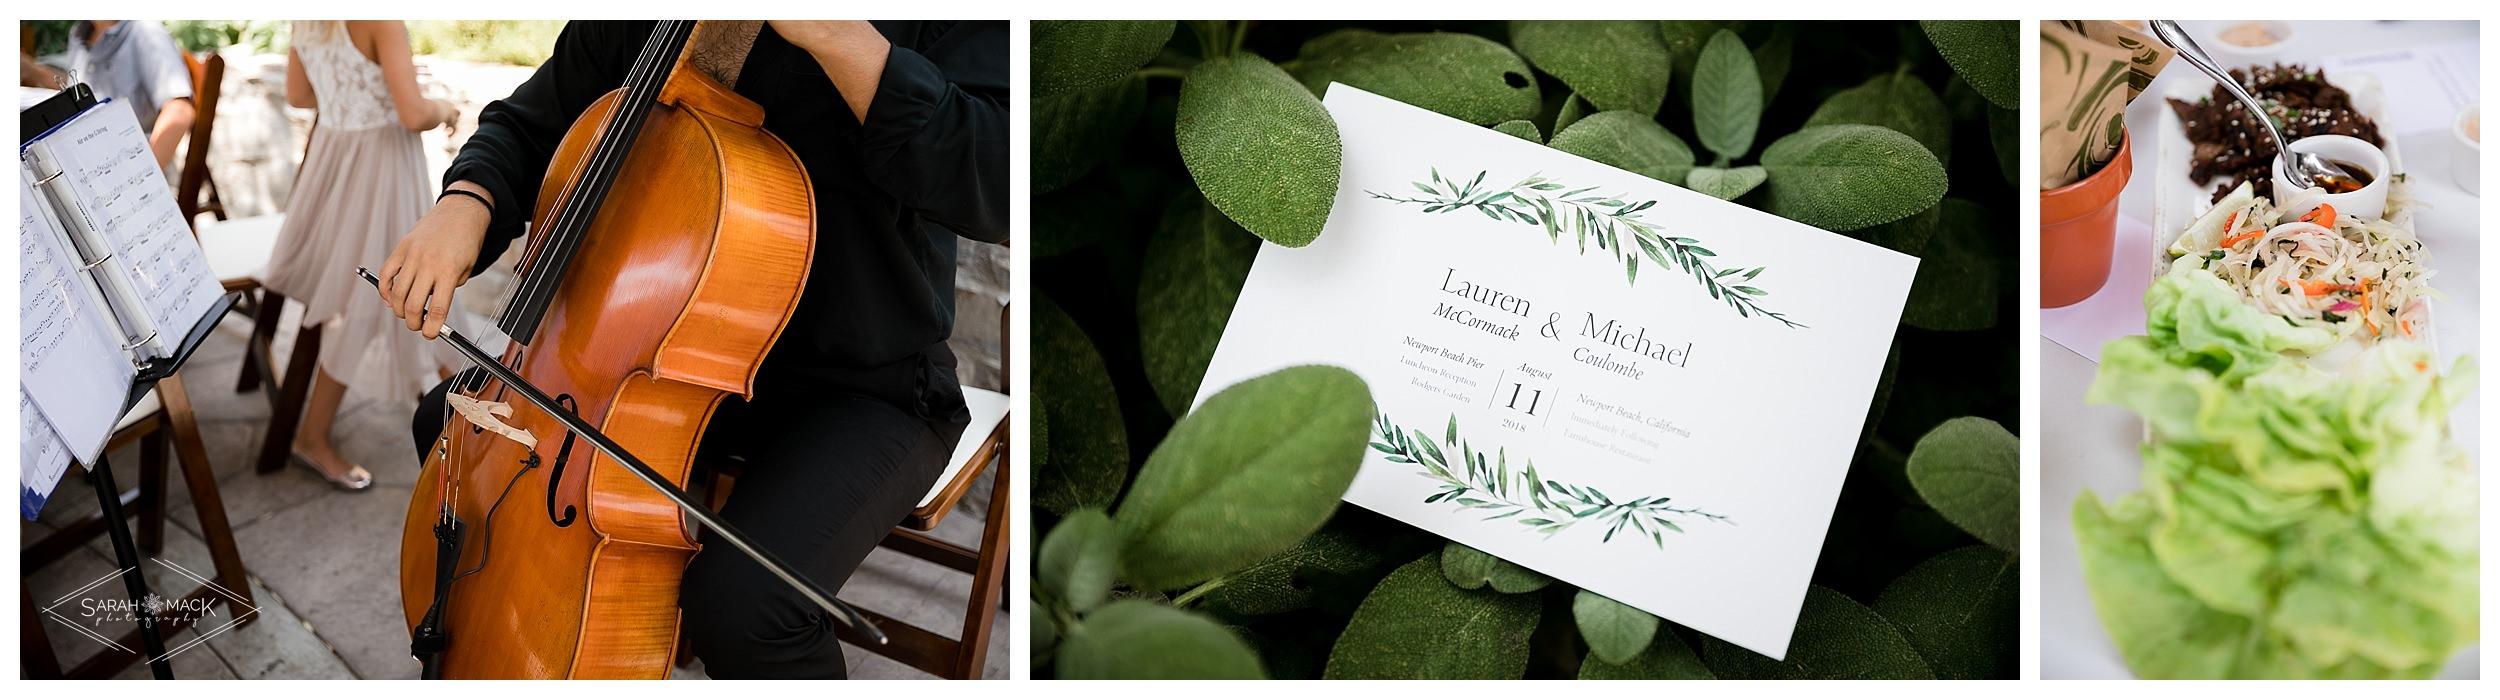 LM-Newport-Beach-Pier-Intimate-Wedding-Photography 186.jpg